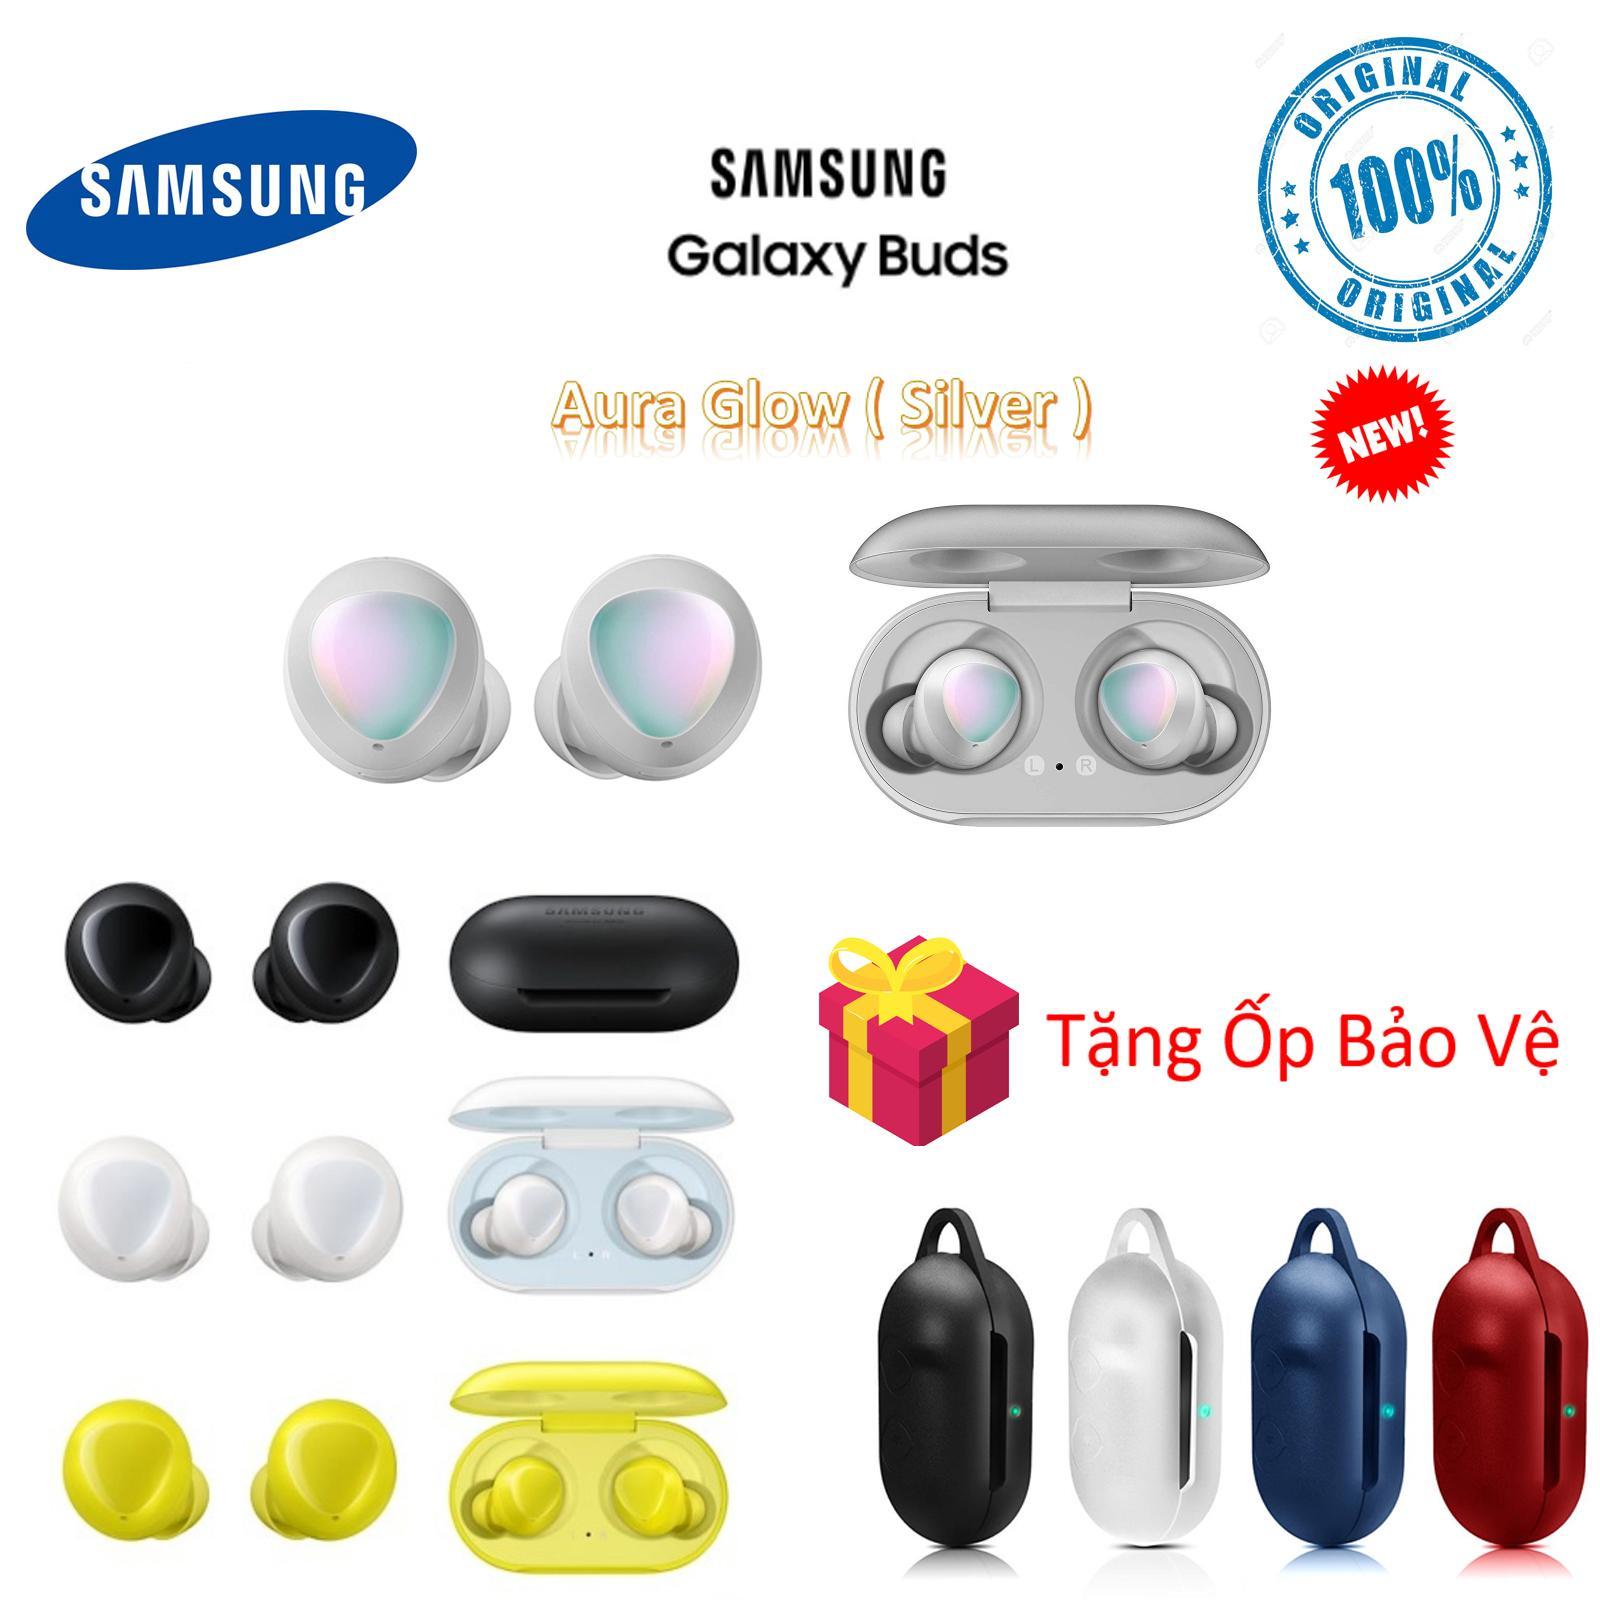 Tai Nghe Bluetooth Samsung Galaxy Buds ( New 2019 ) Giảm Cực Sốc